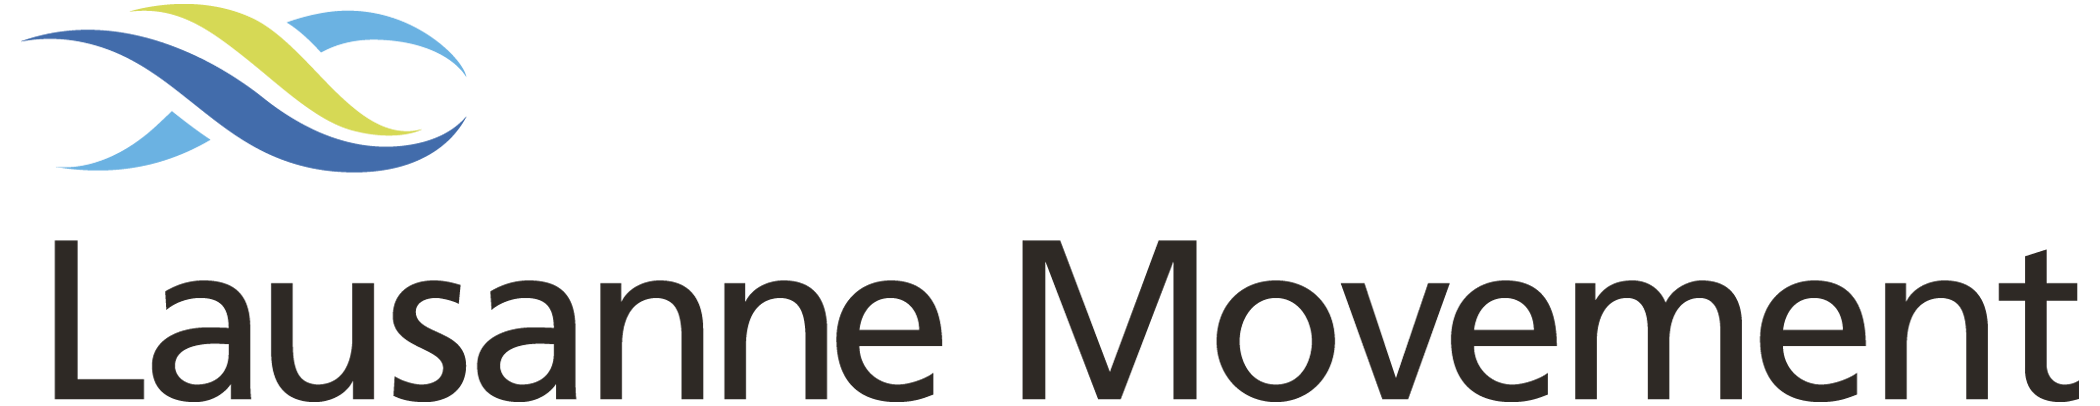 Lausanne Movement Logo (English - Large)